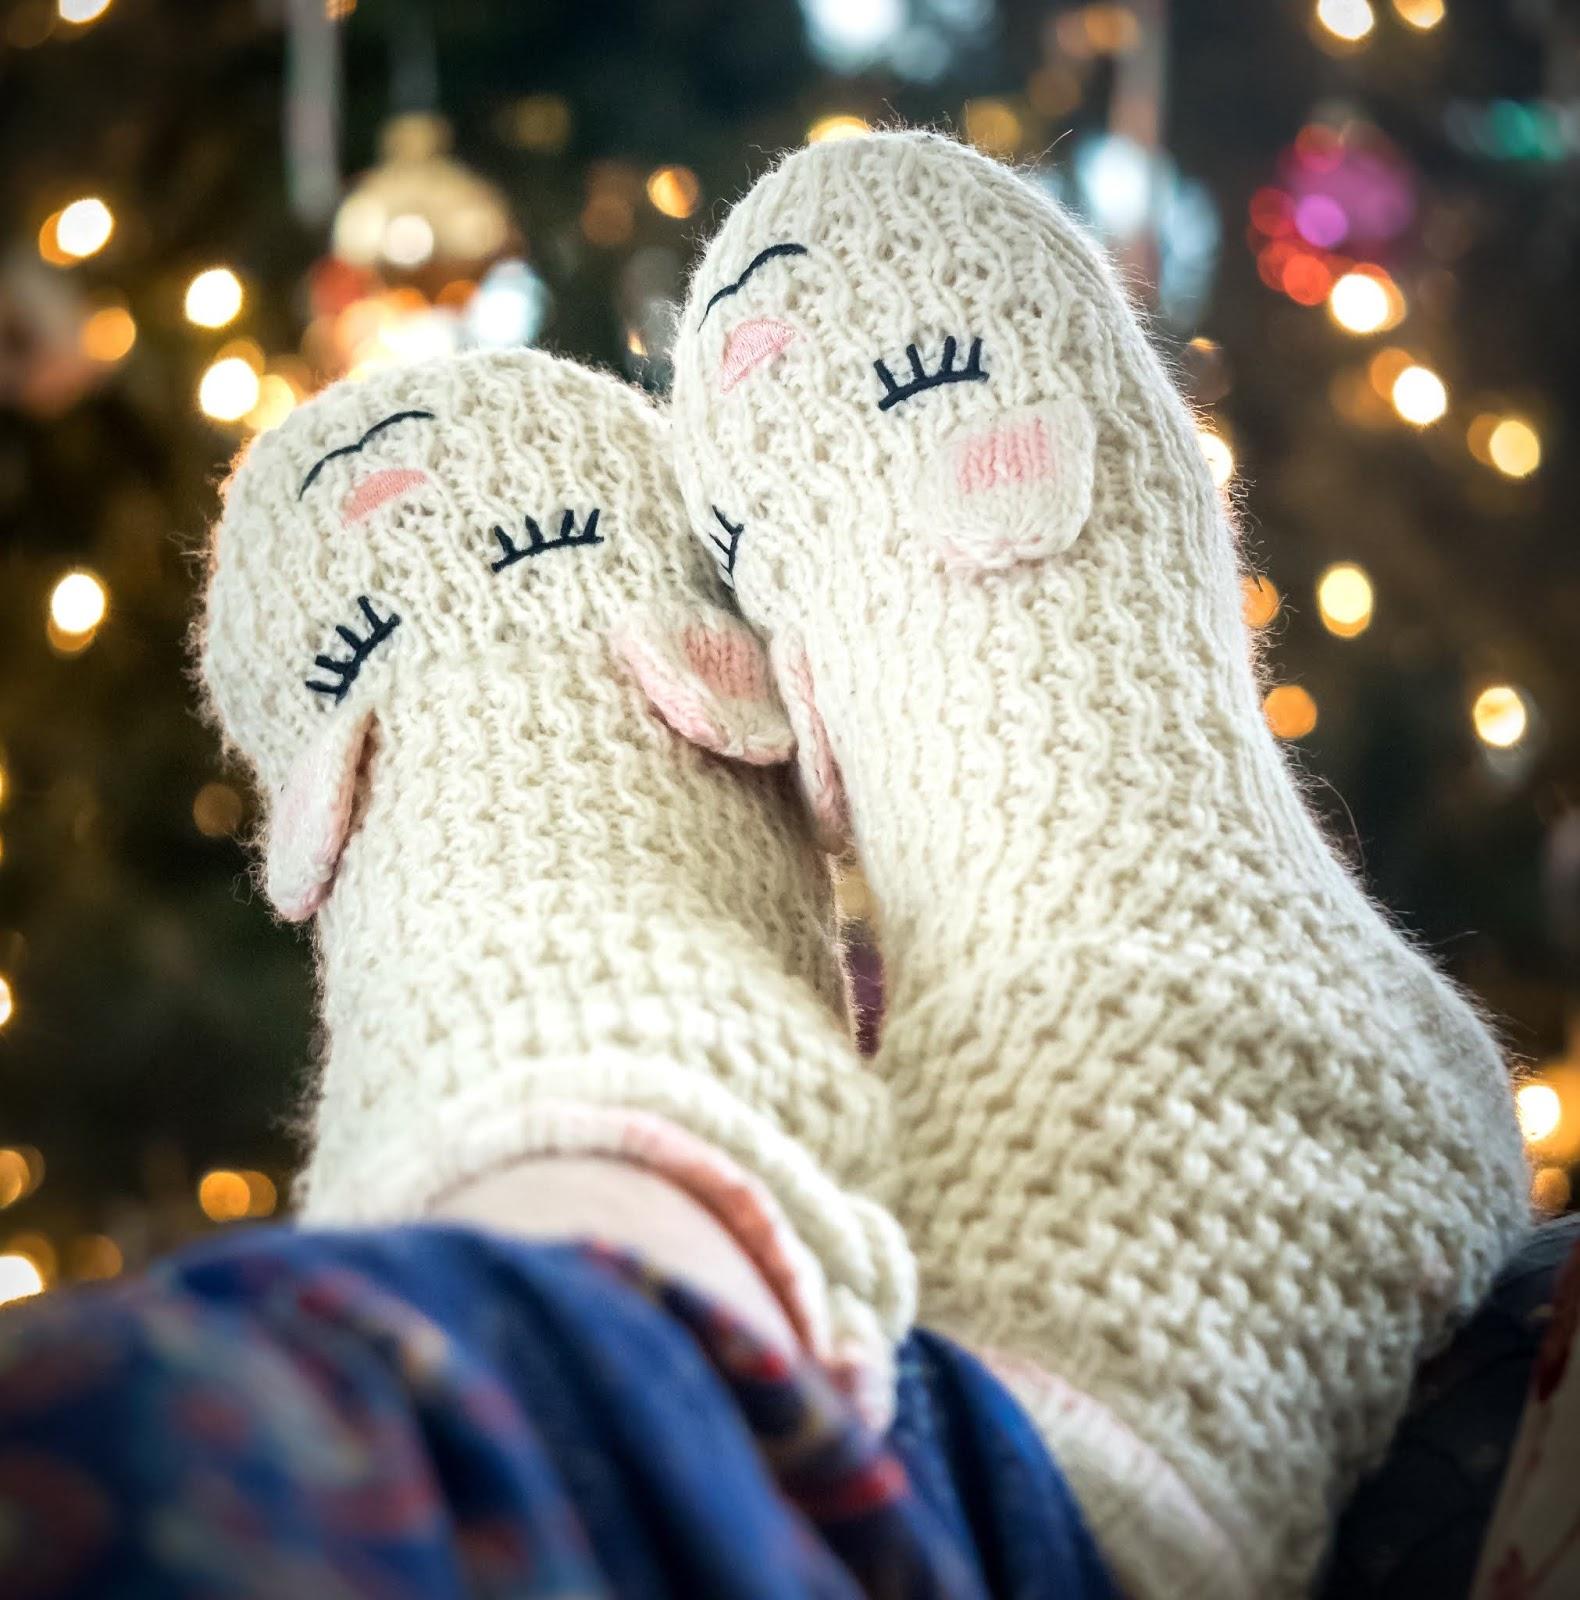 Merry Christmas Socks DP